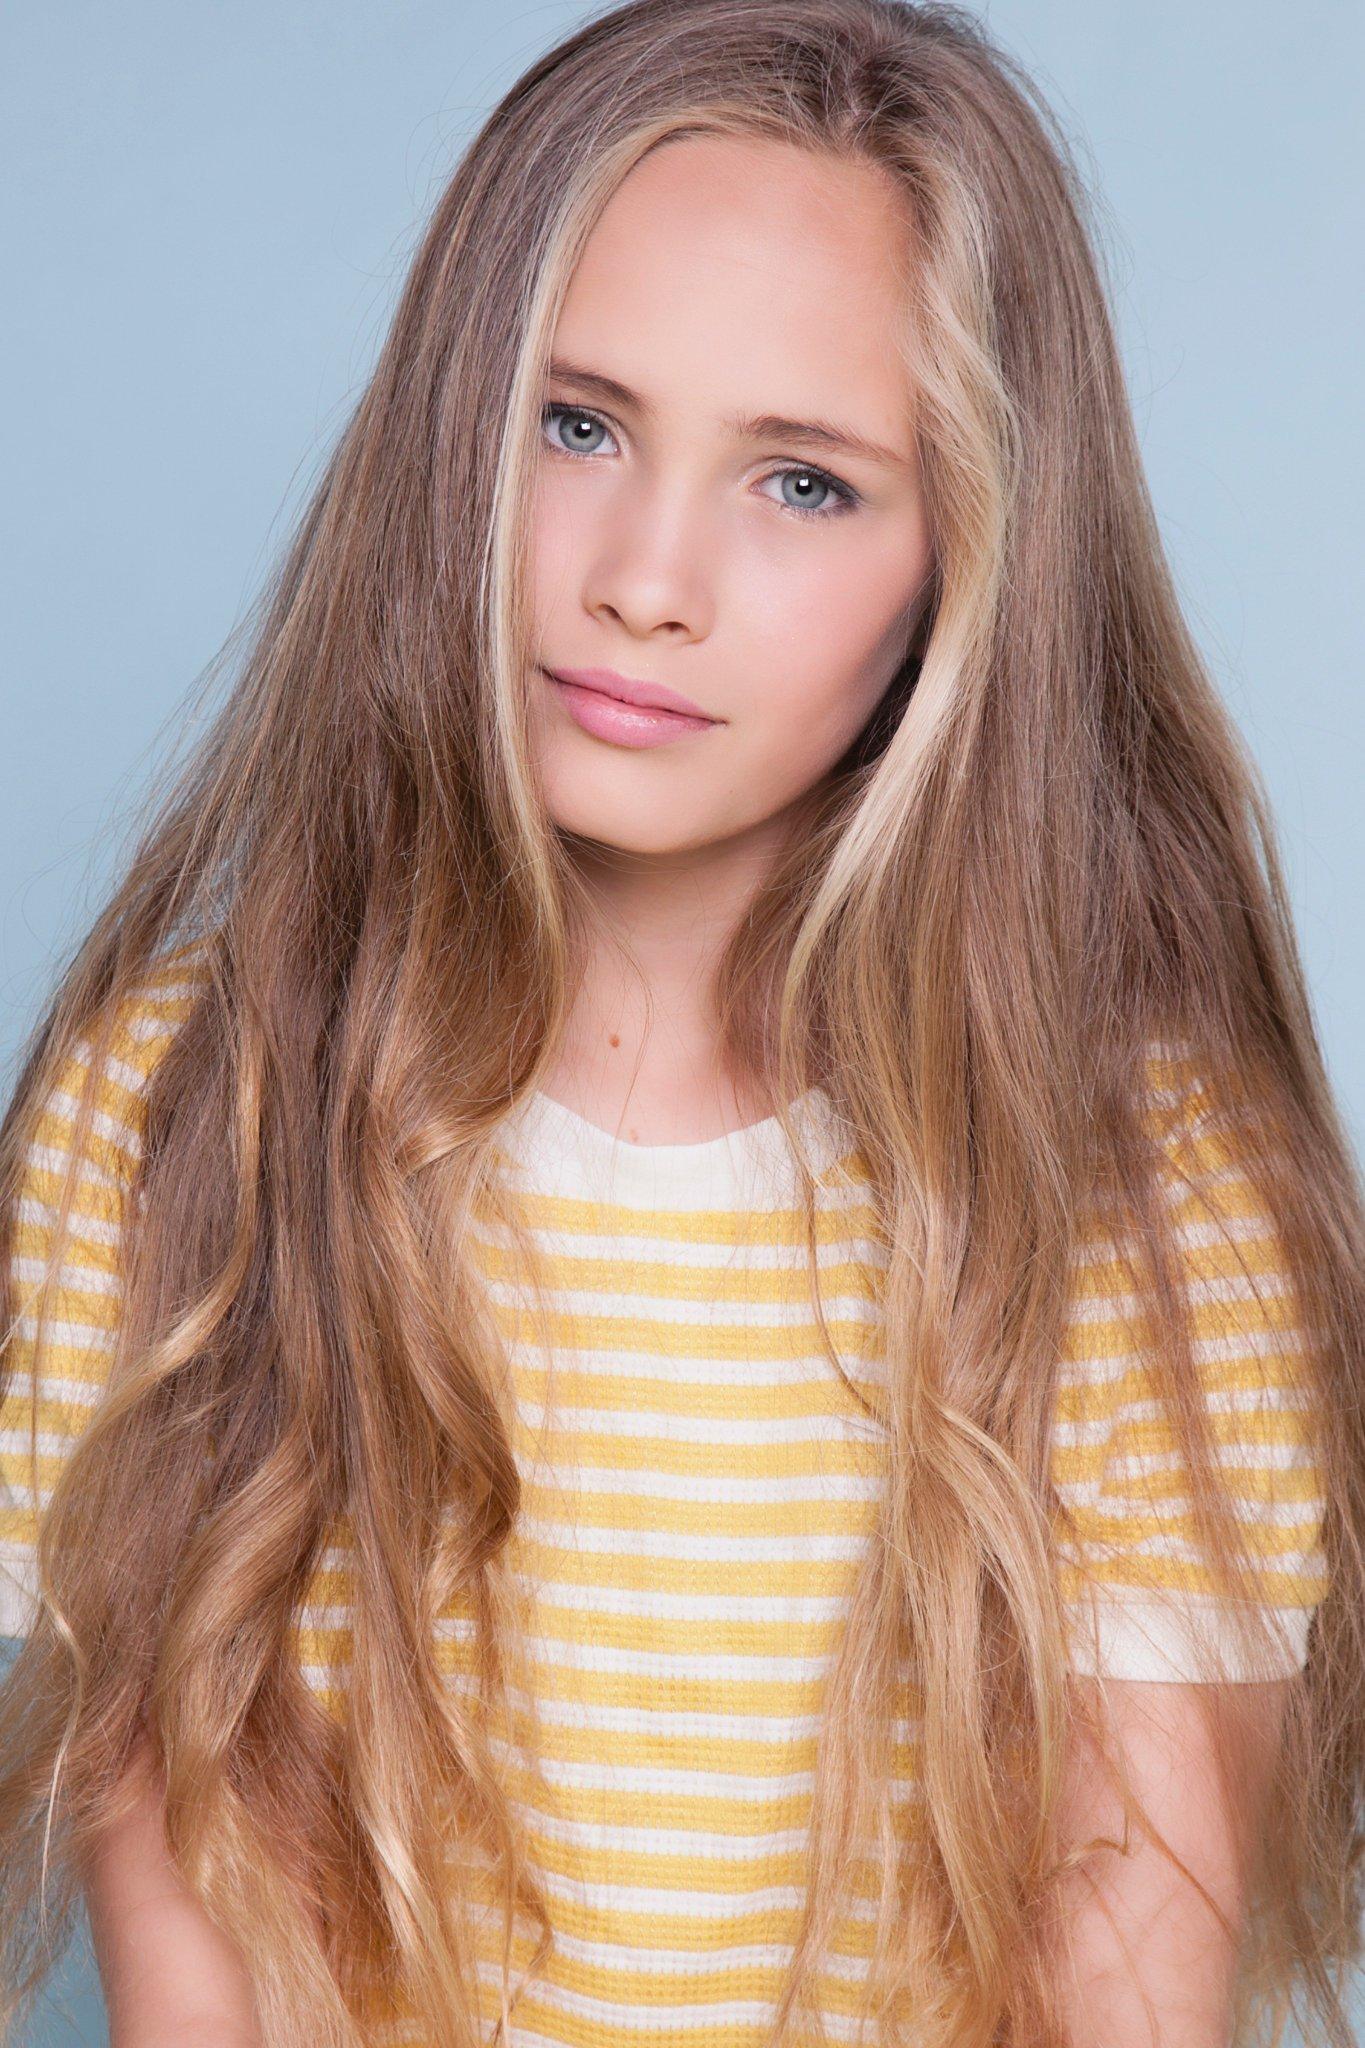 Ukraine Model Casting